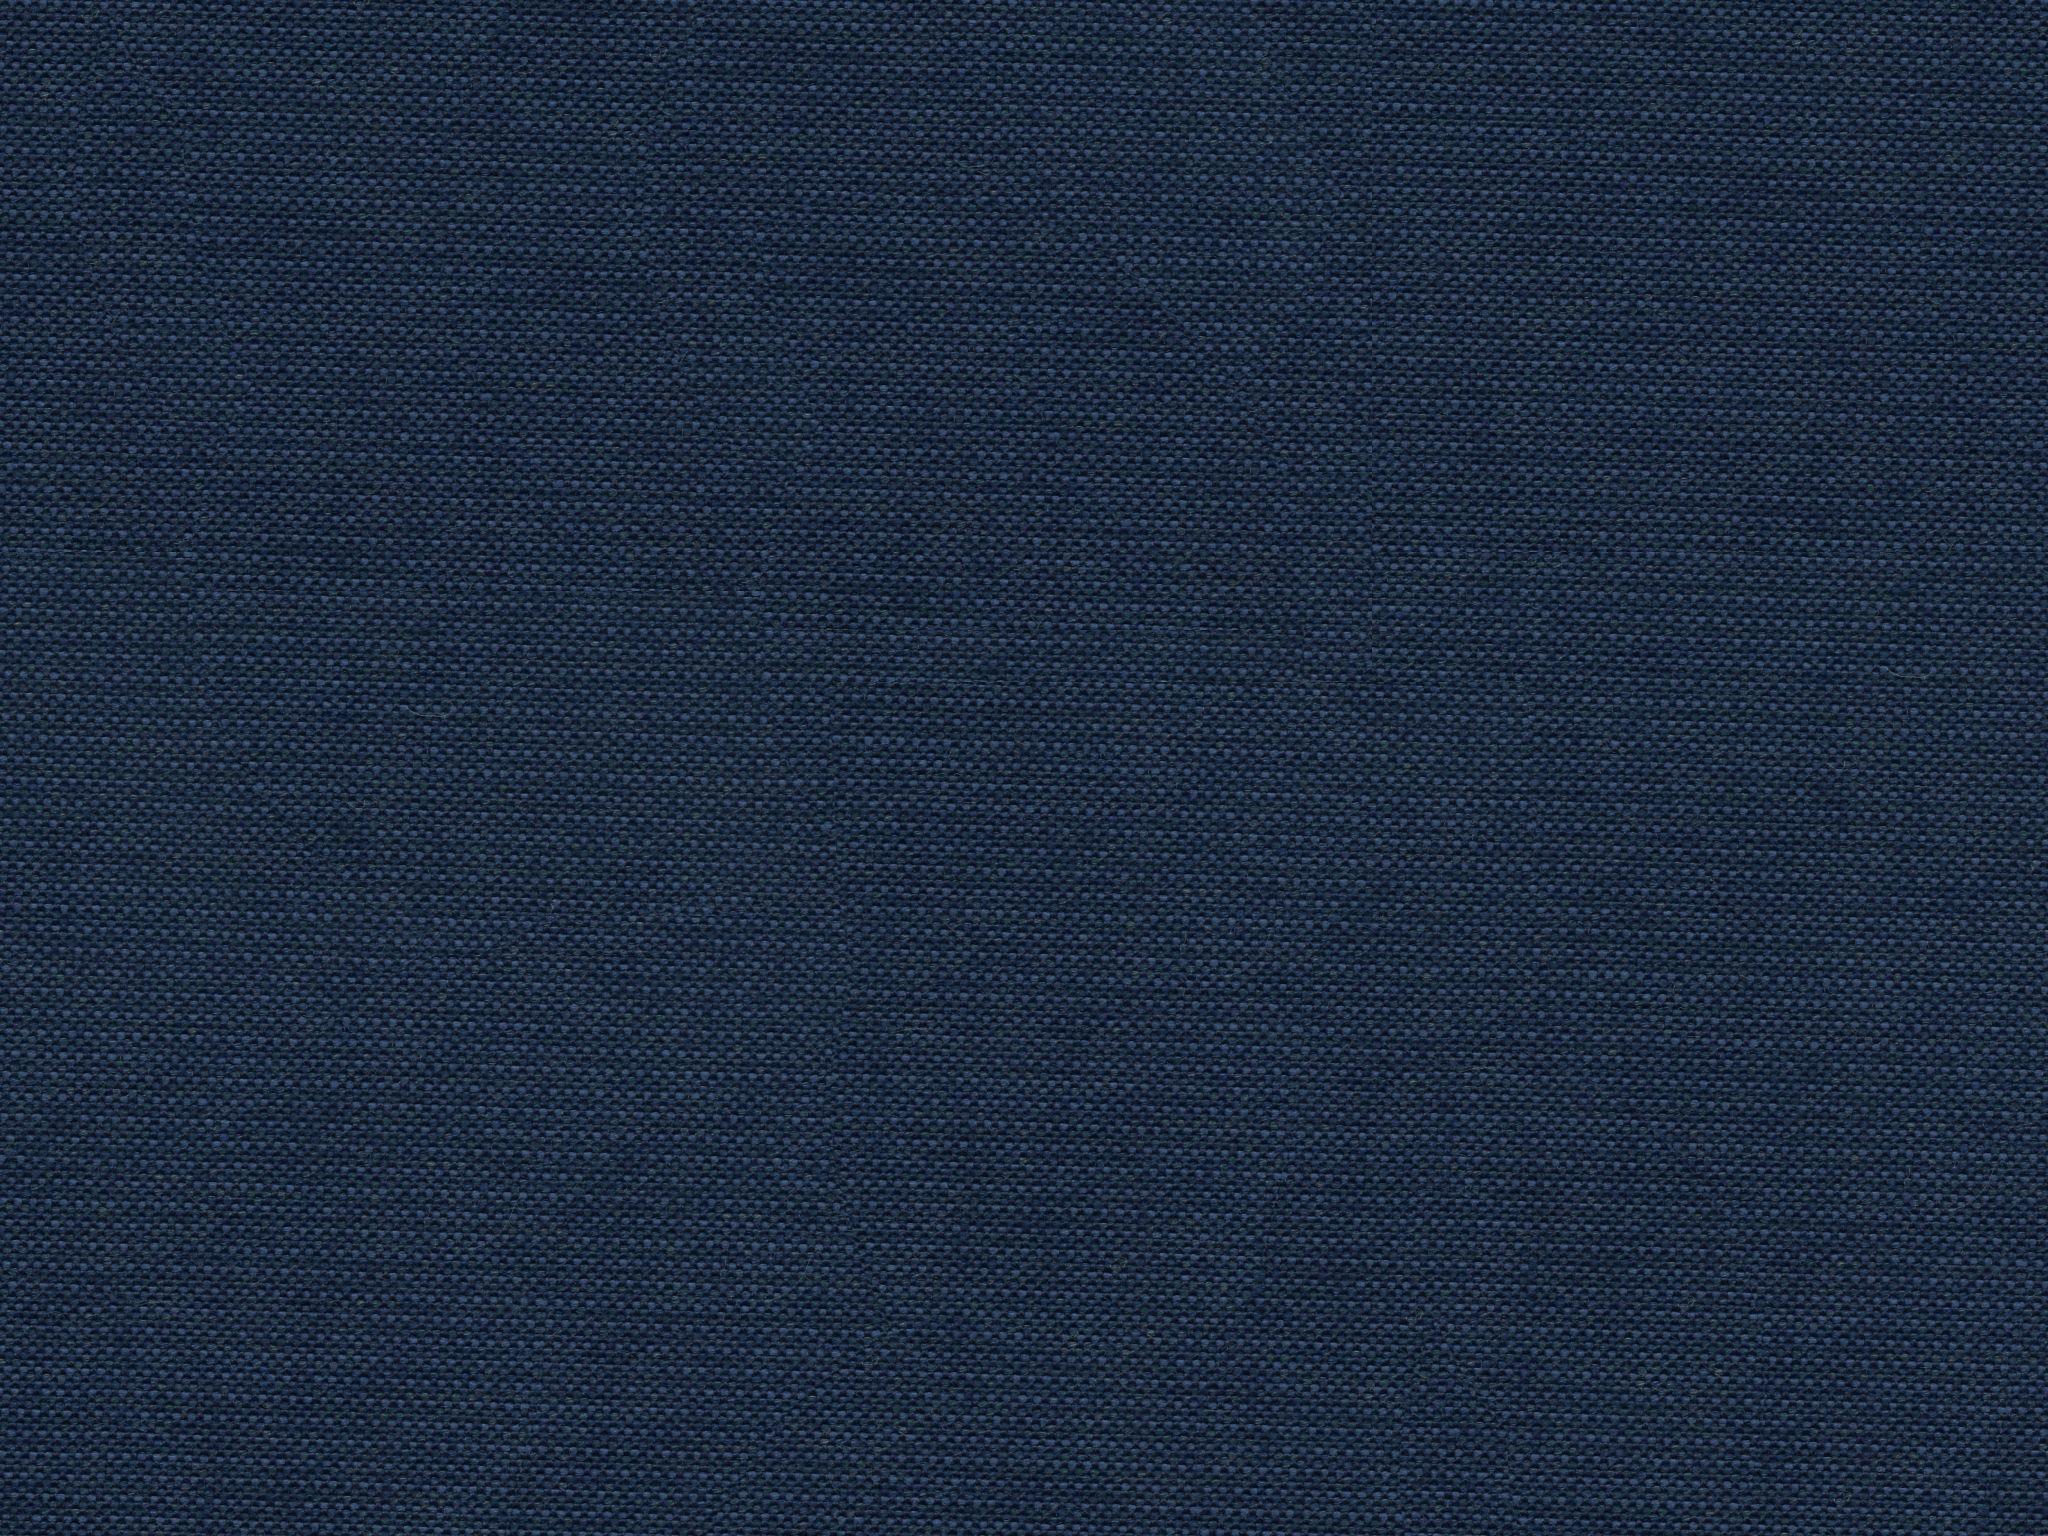 Braxton Culler Sunbrella Outdoor Indoor Performance Fabric